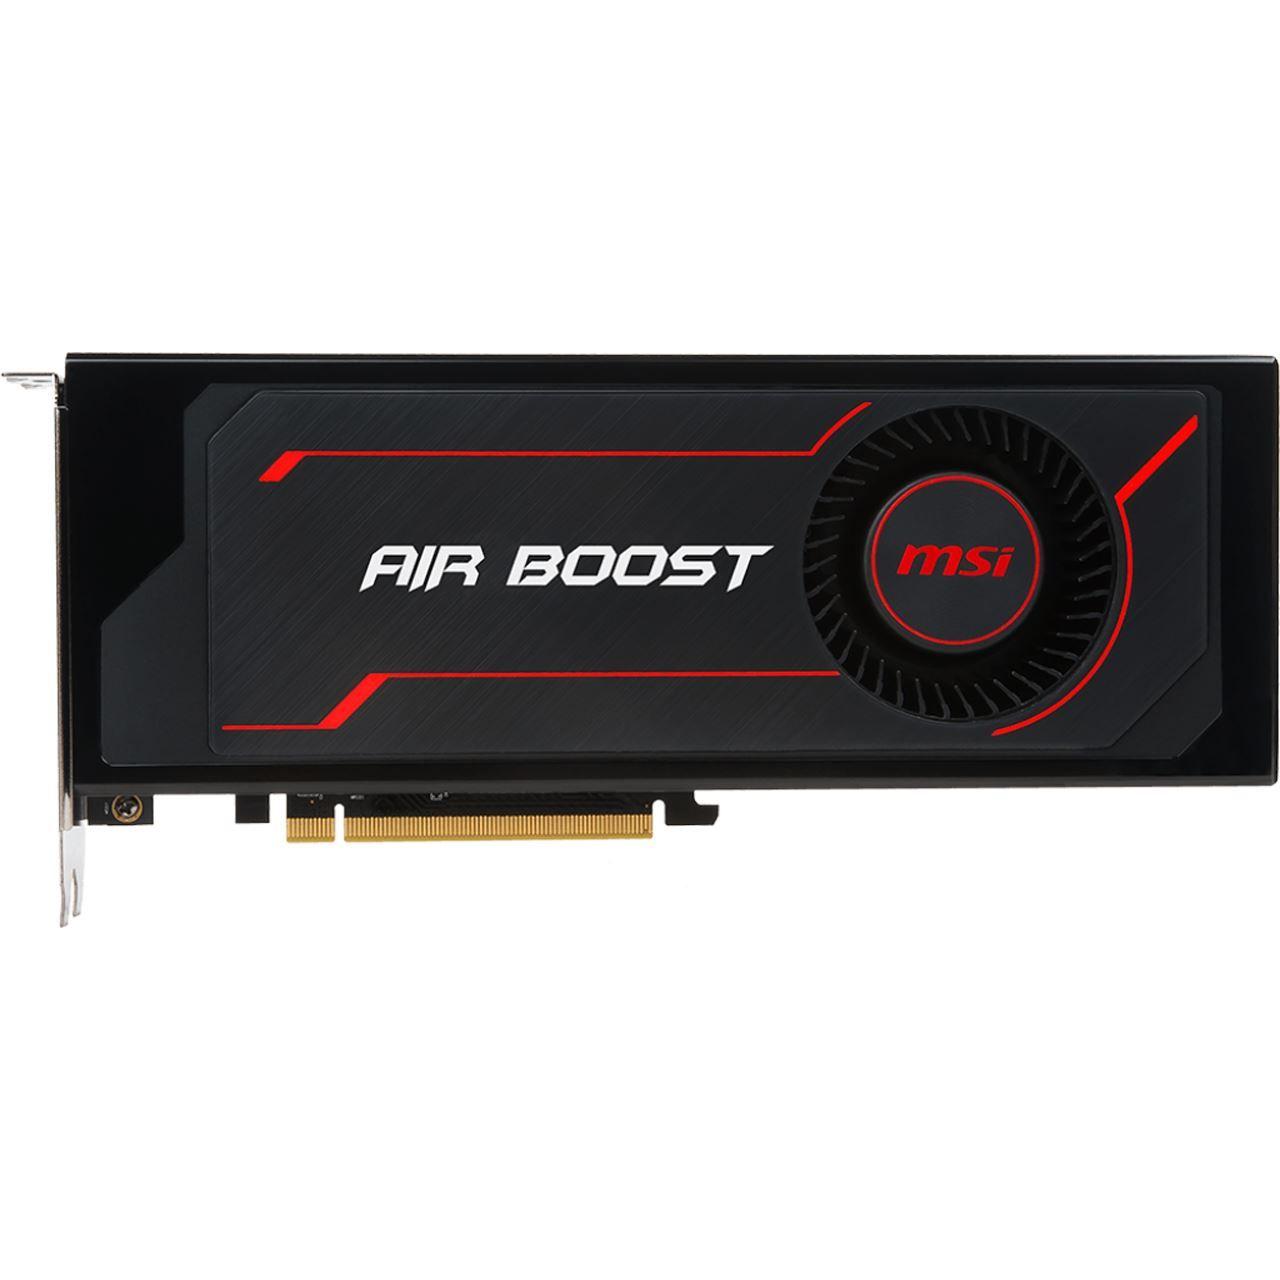 Mindstar 8GB MSI Radeon RX Vega 56 AIR BOOST 8G OC Aktiv PCIe 3.0 x16 (Retail) plus 3 Spiele gratis